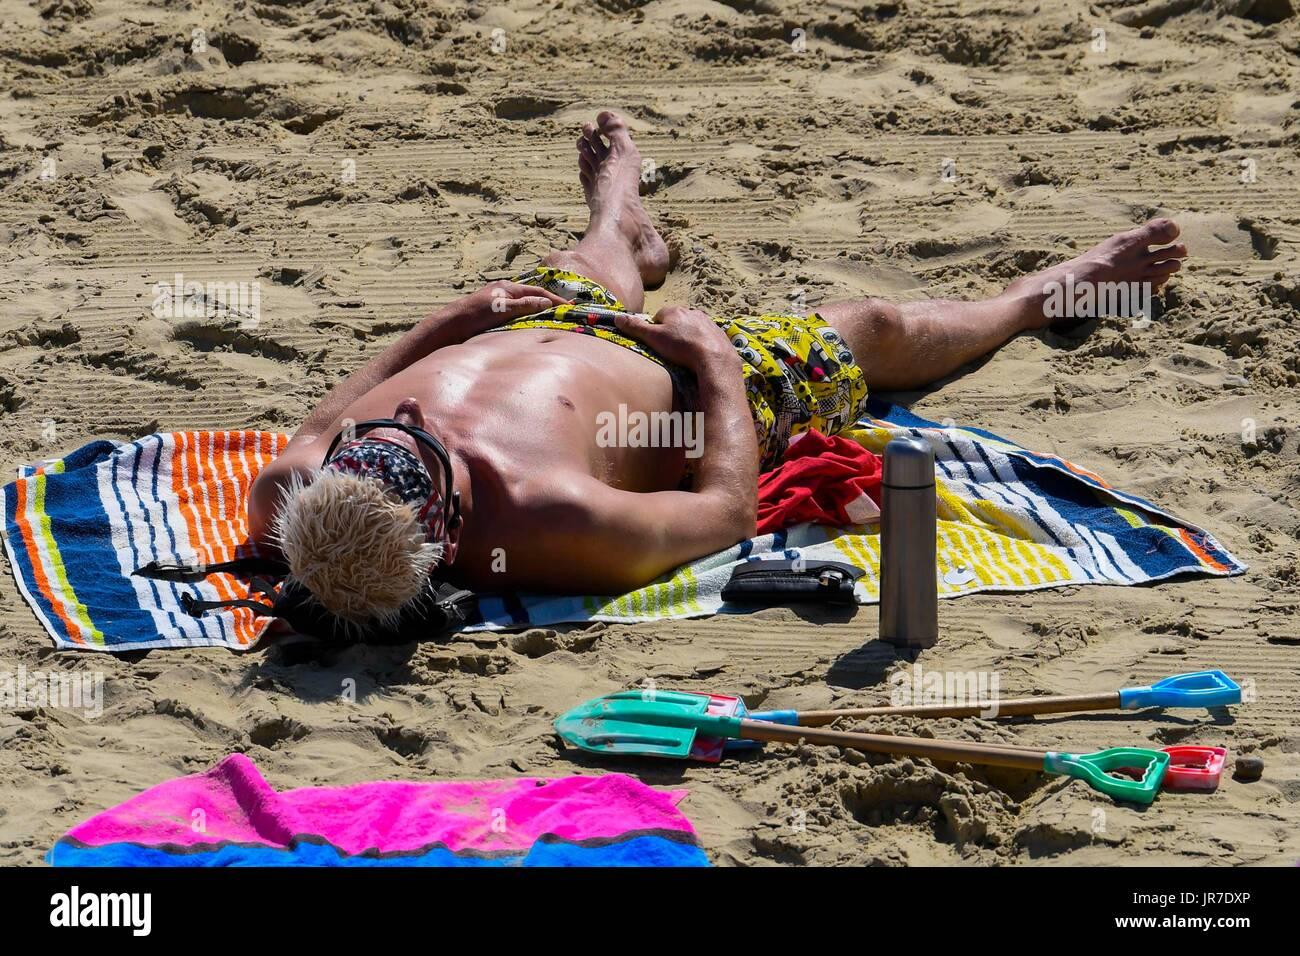 Lyme Regis, Dorset, UK. 4th August 2017.  UK Weather.   A sunbather on the beach enjoying the warm sunshine at the seaside resort of Lyme Regis in Dorset.  Photo Credit: Graham Hunt/Alamy Live News - Stock Image